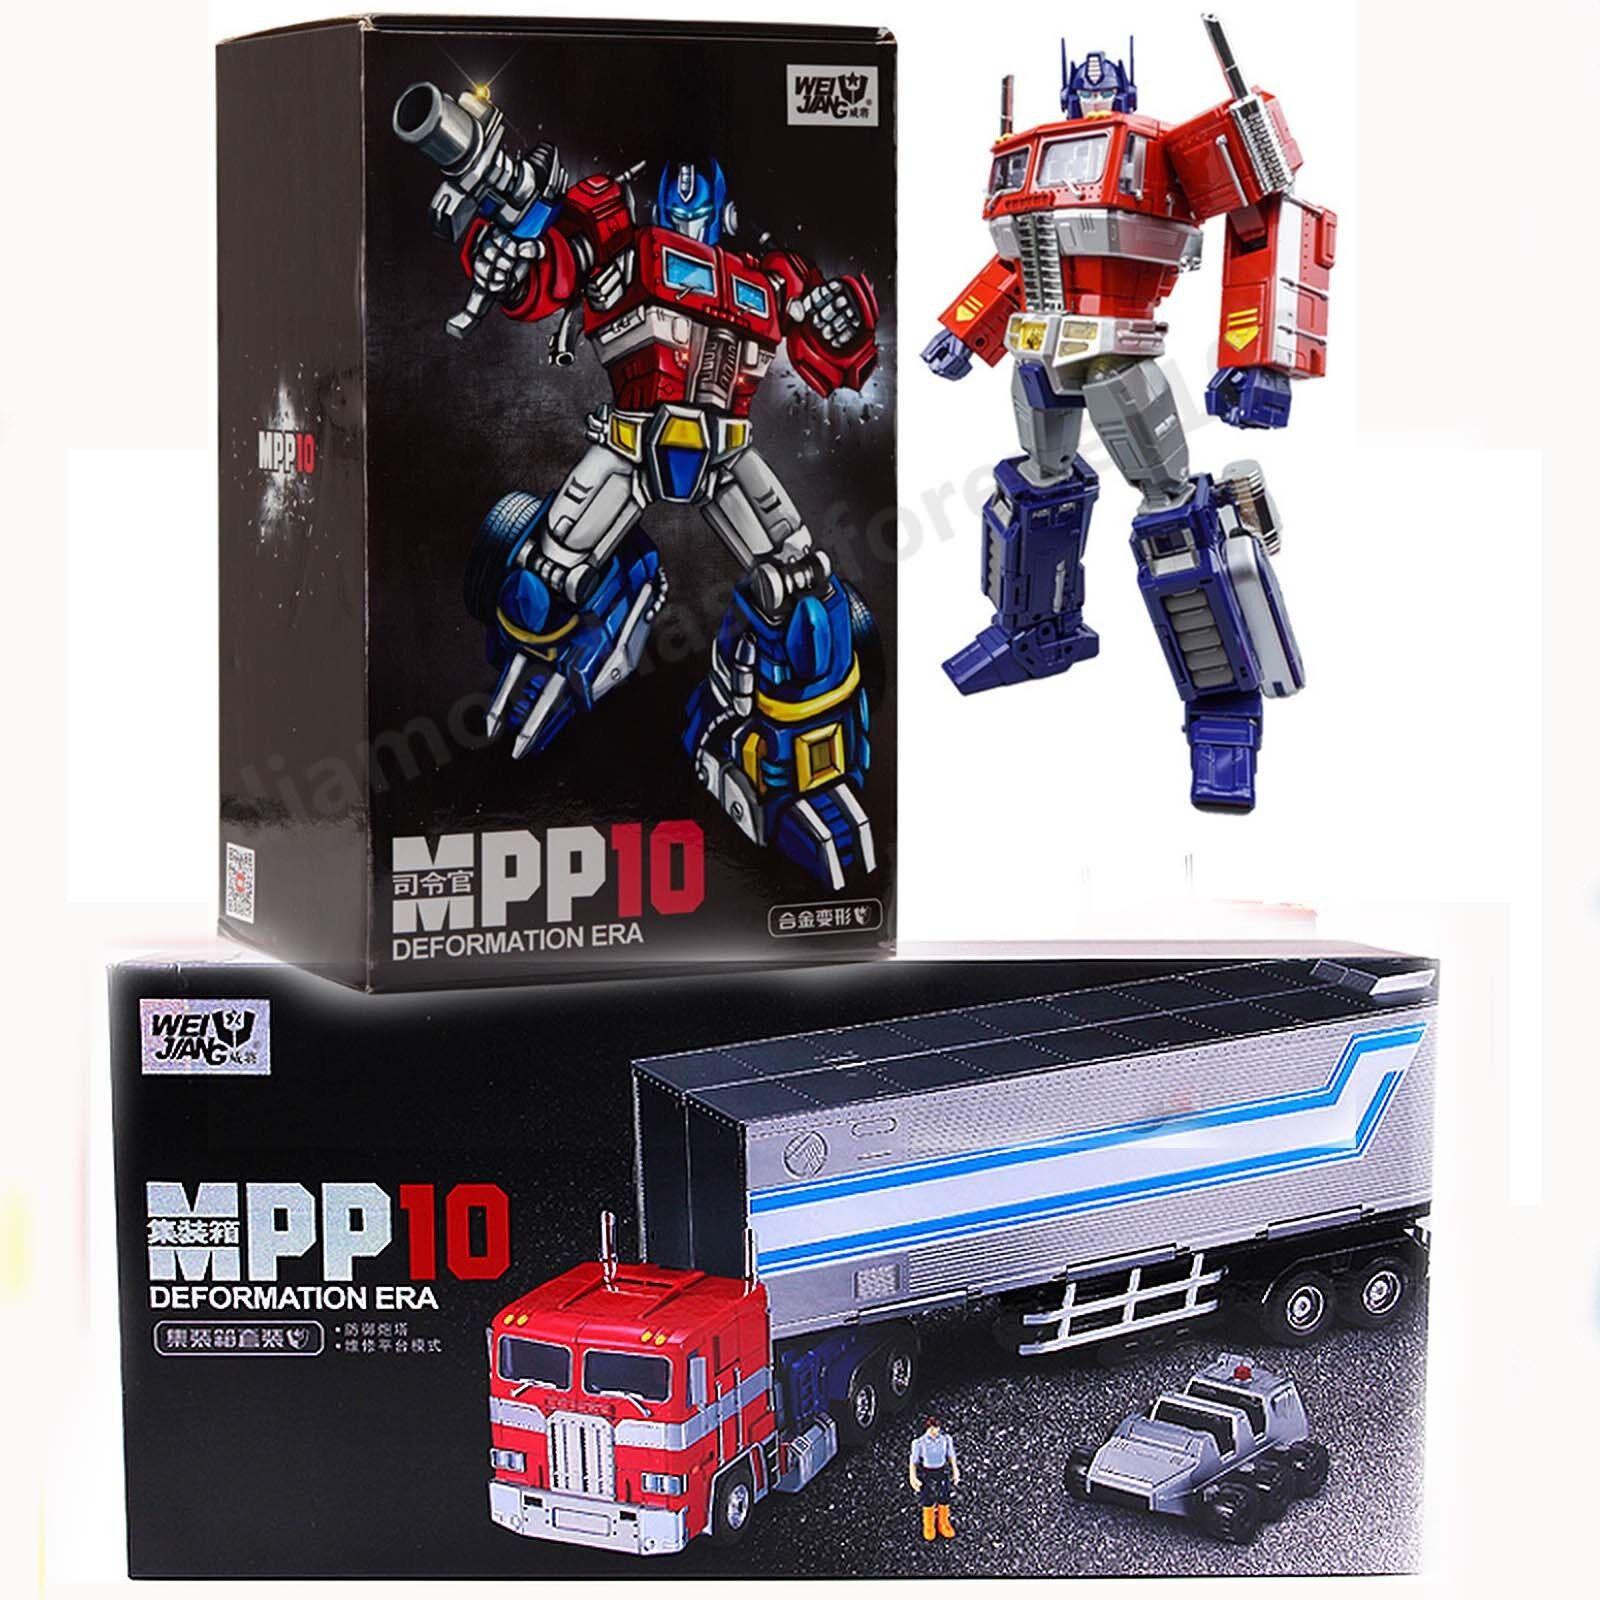 Mpp10, Transformers del Río Wai, Optimus Prime.